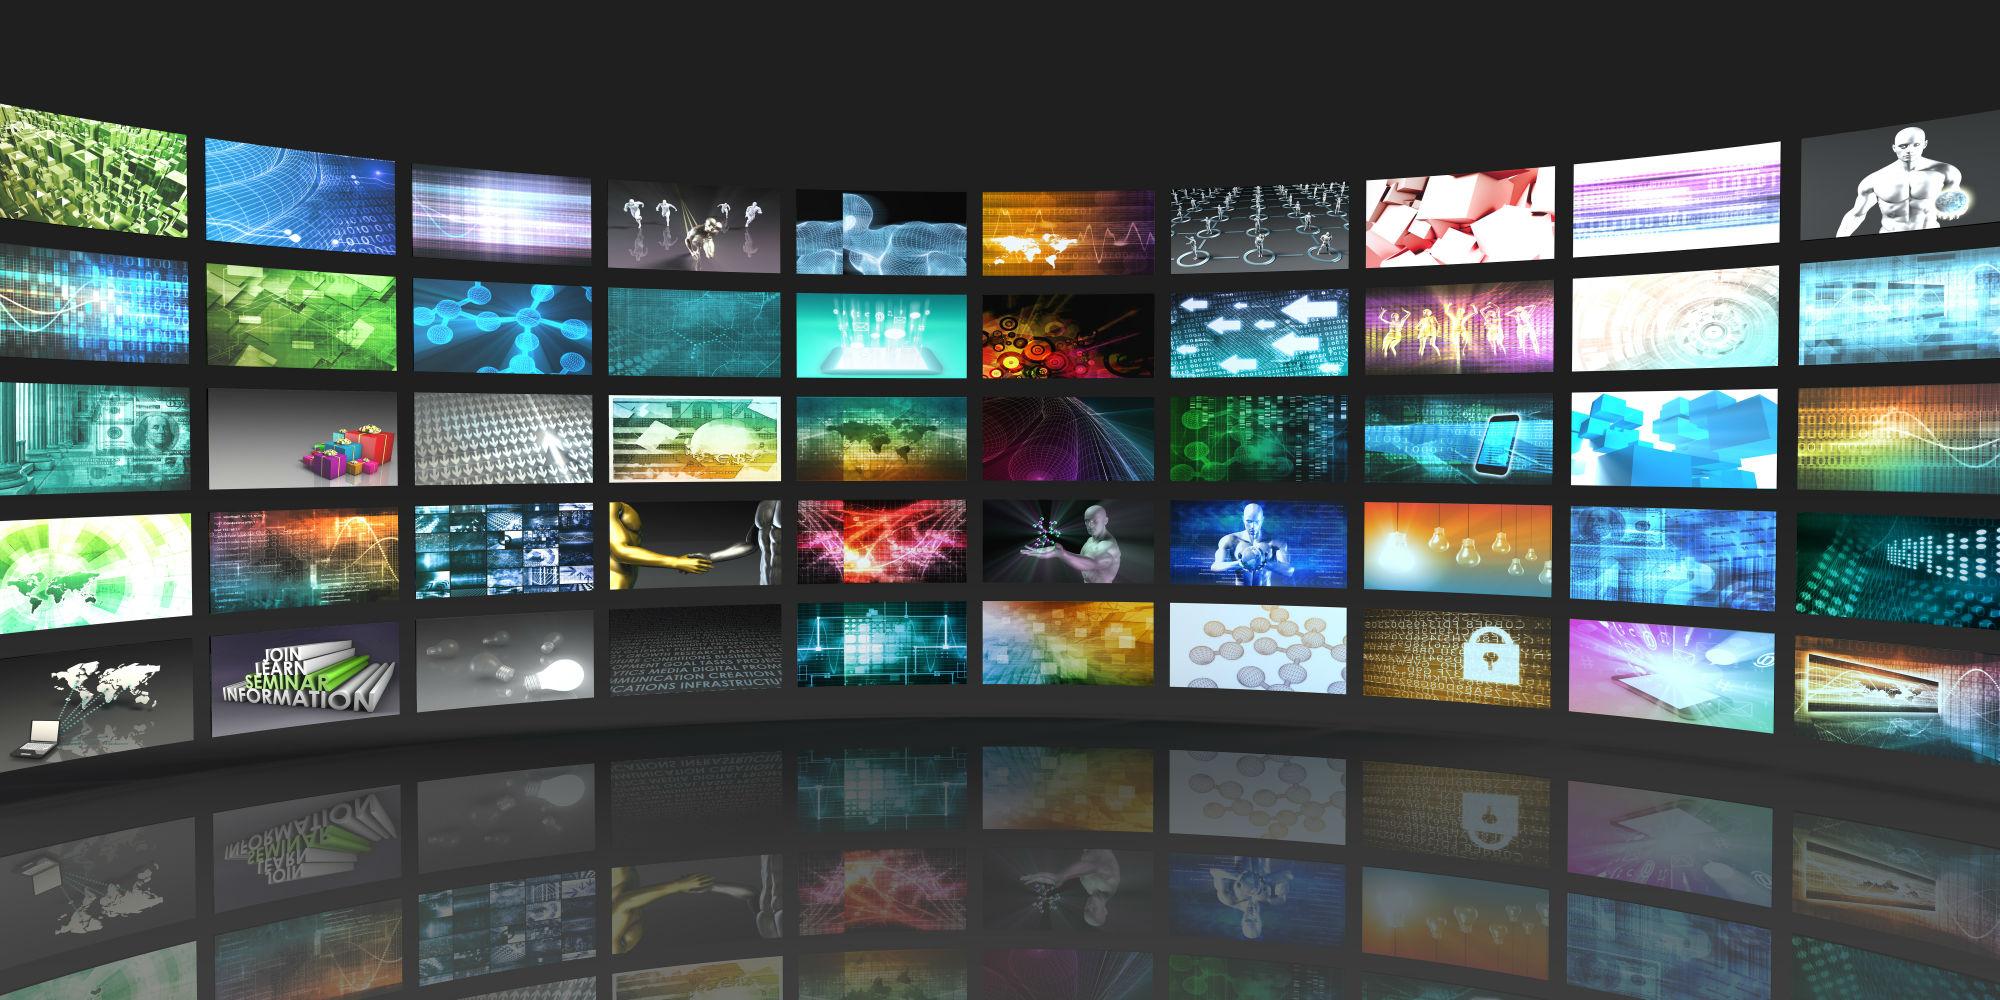 La TV diventa Intelligente